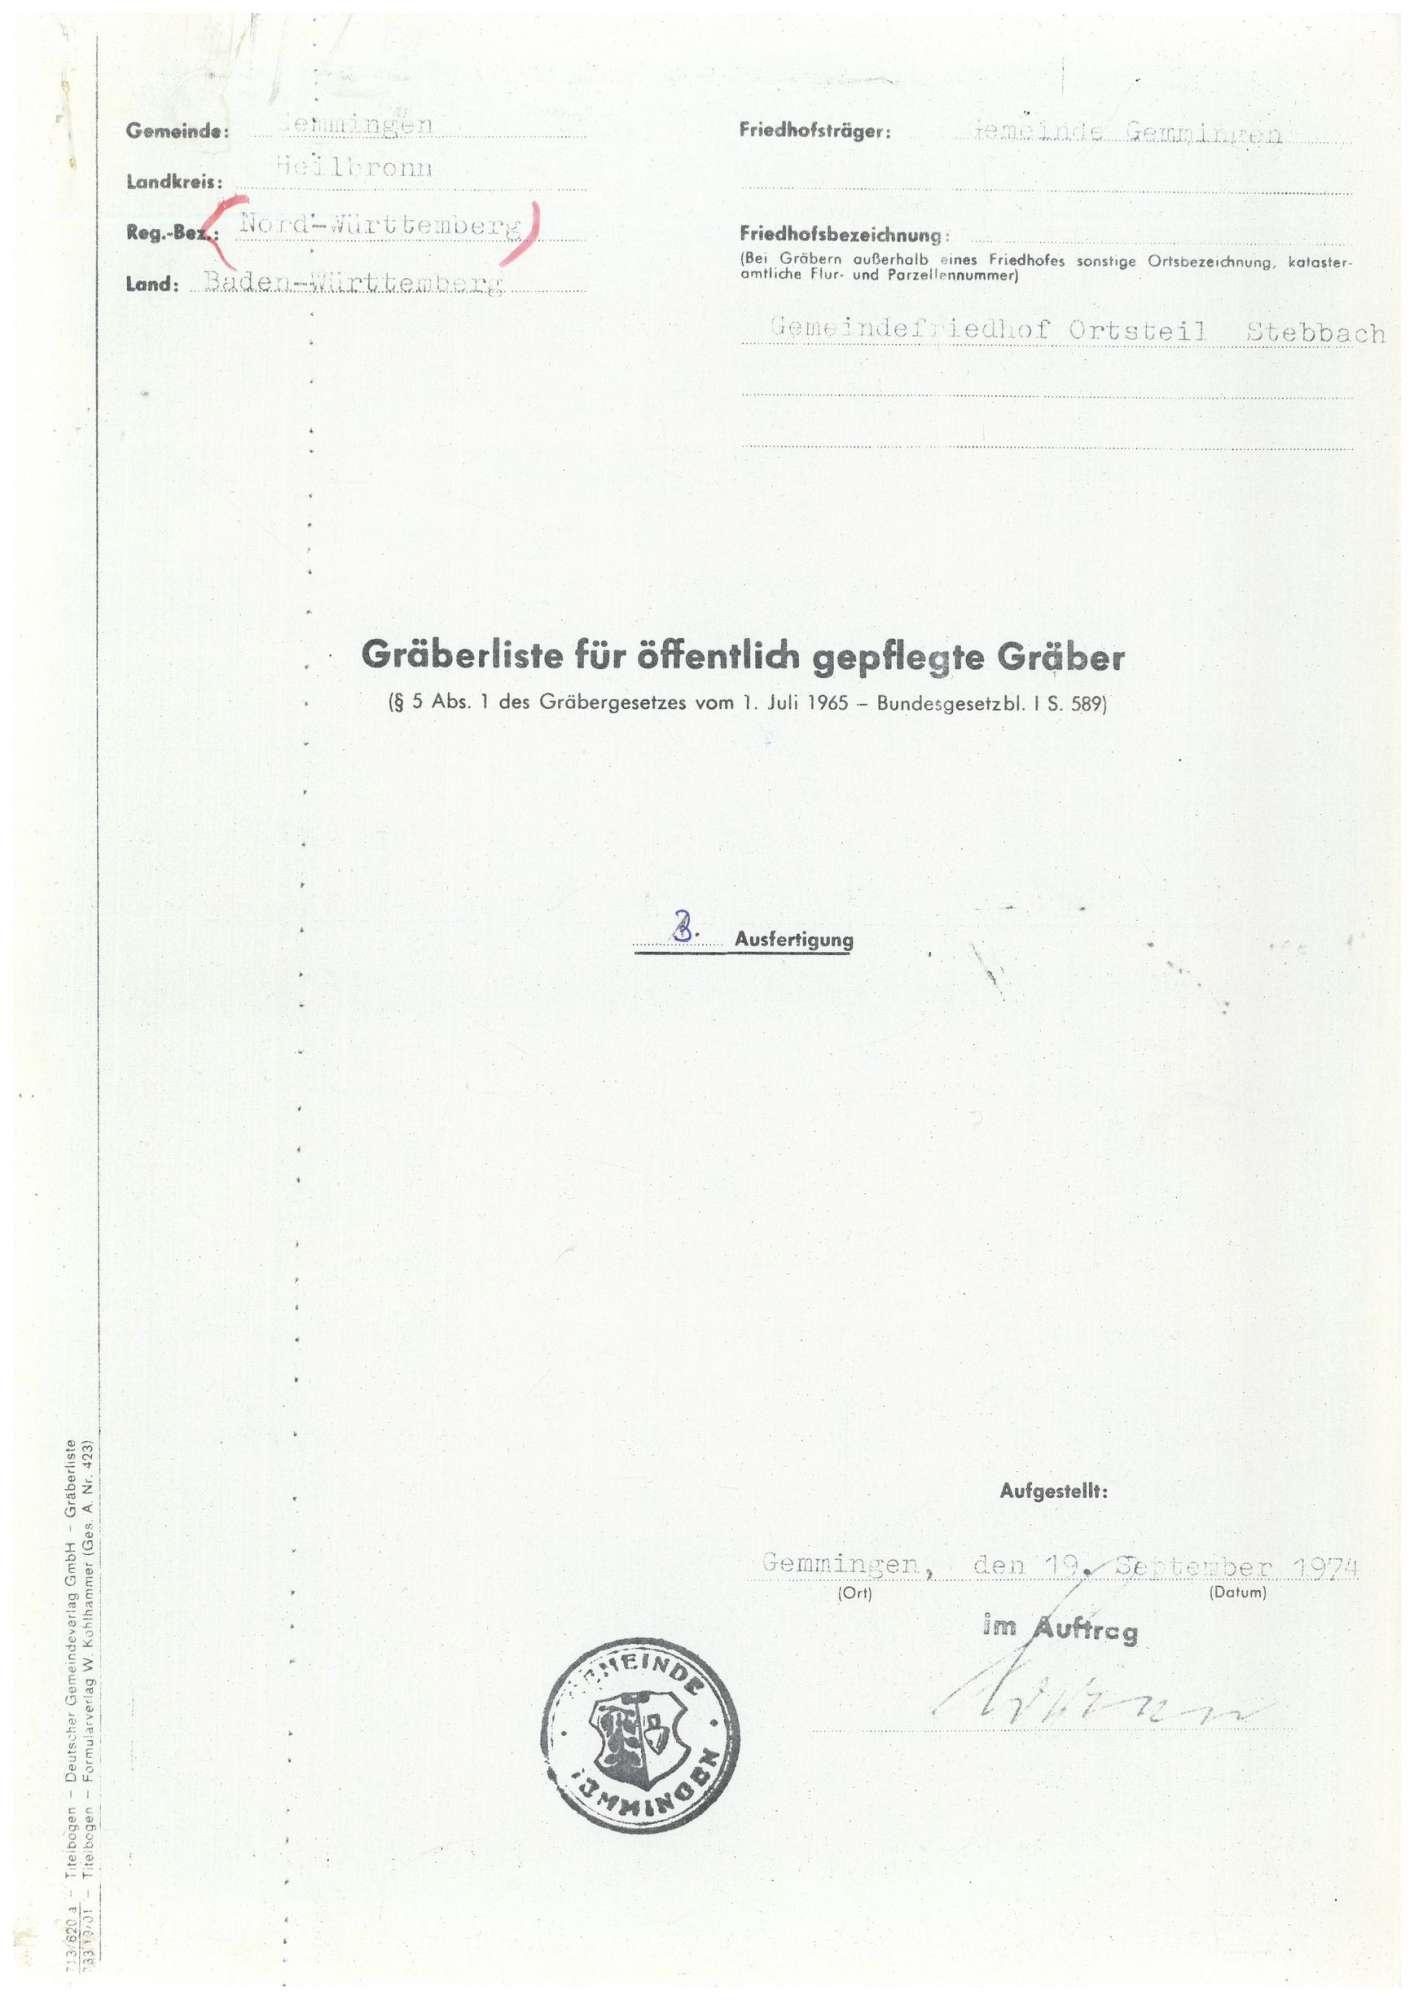 Stebbach, Bild 2